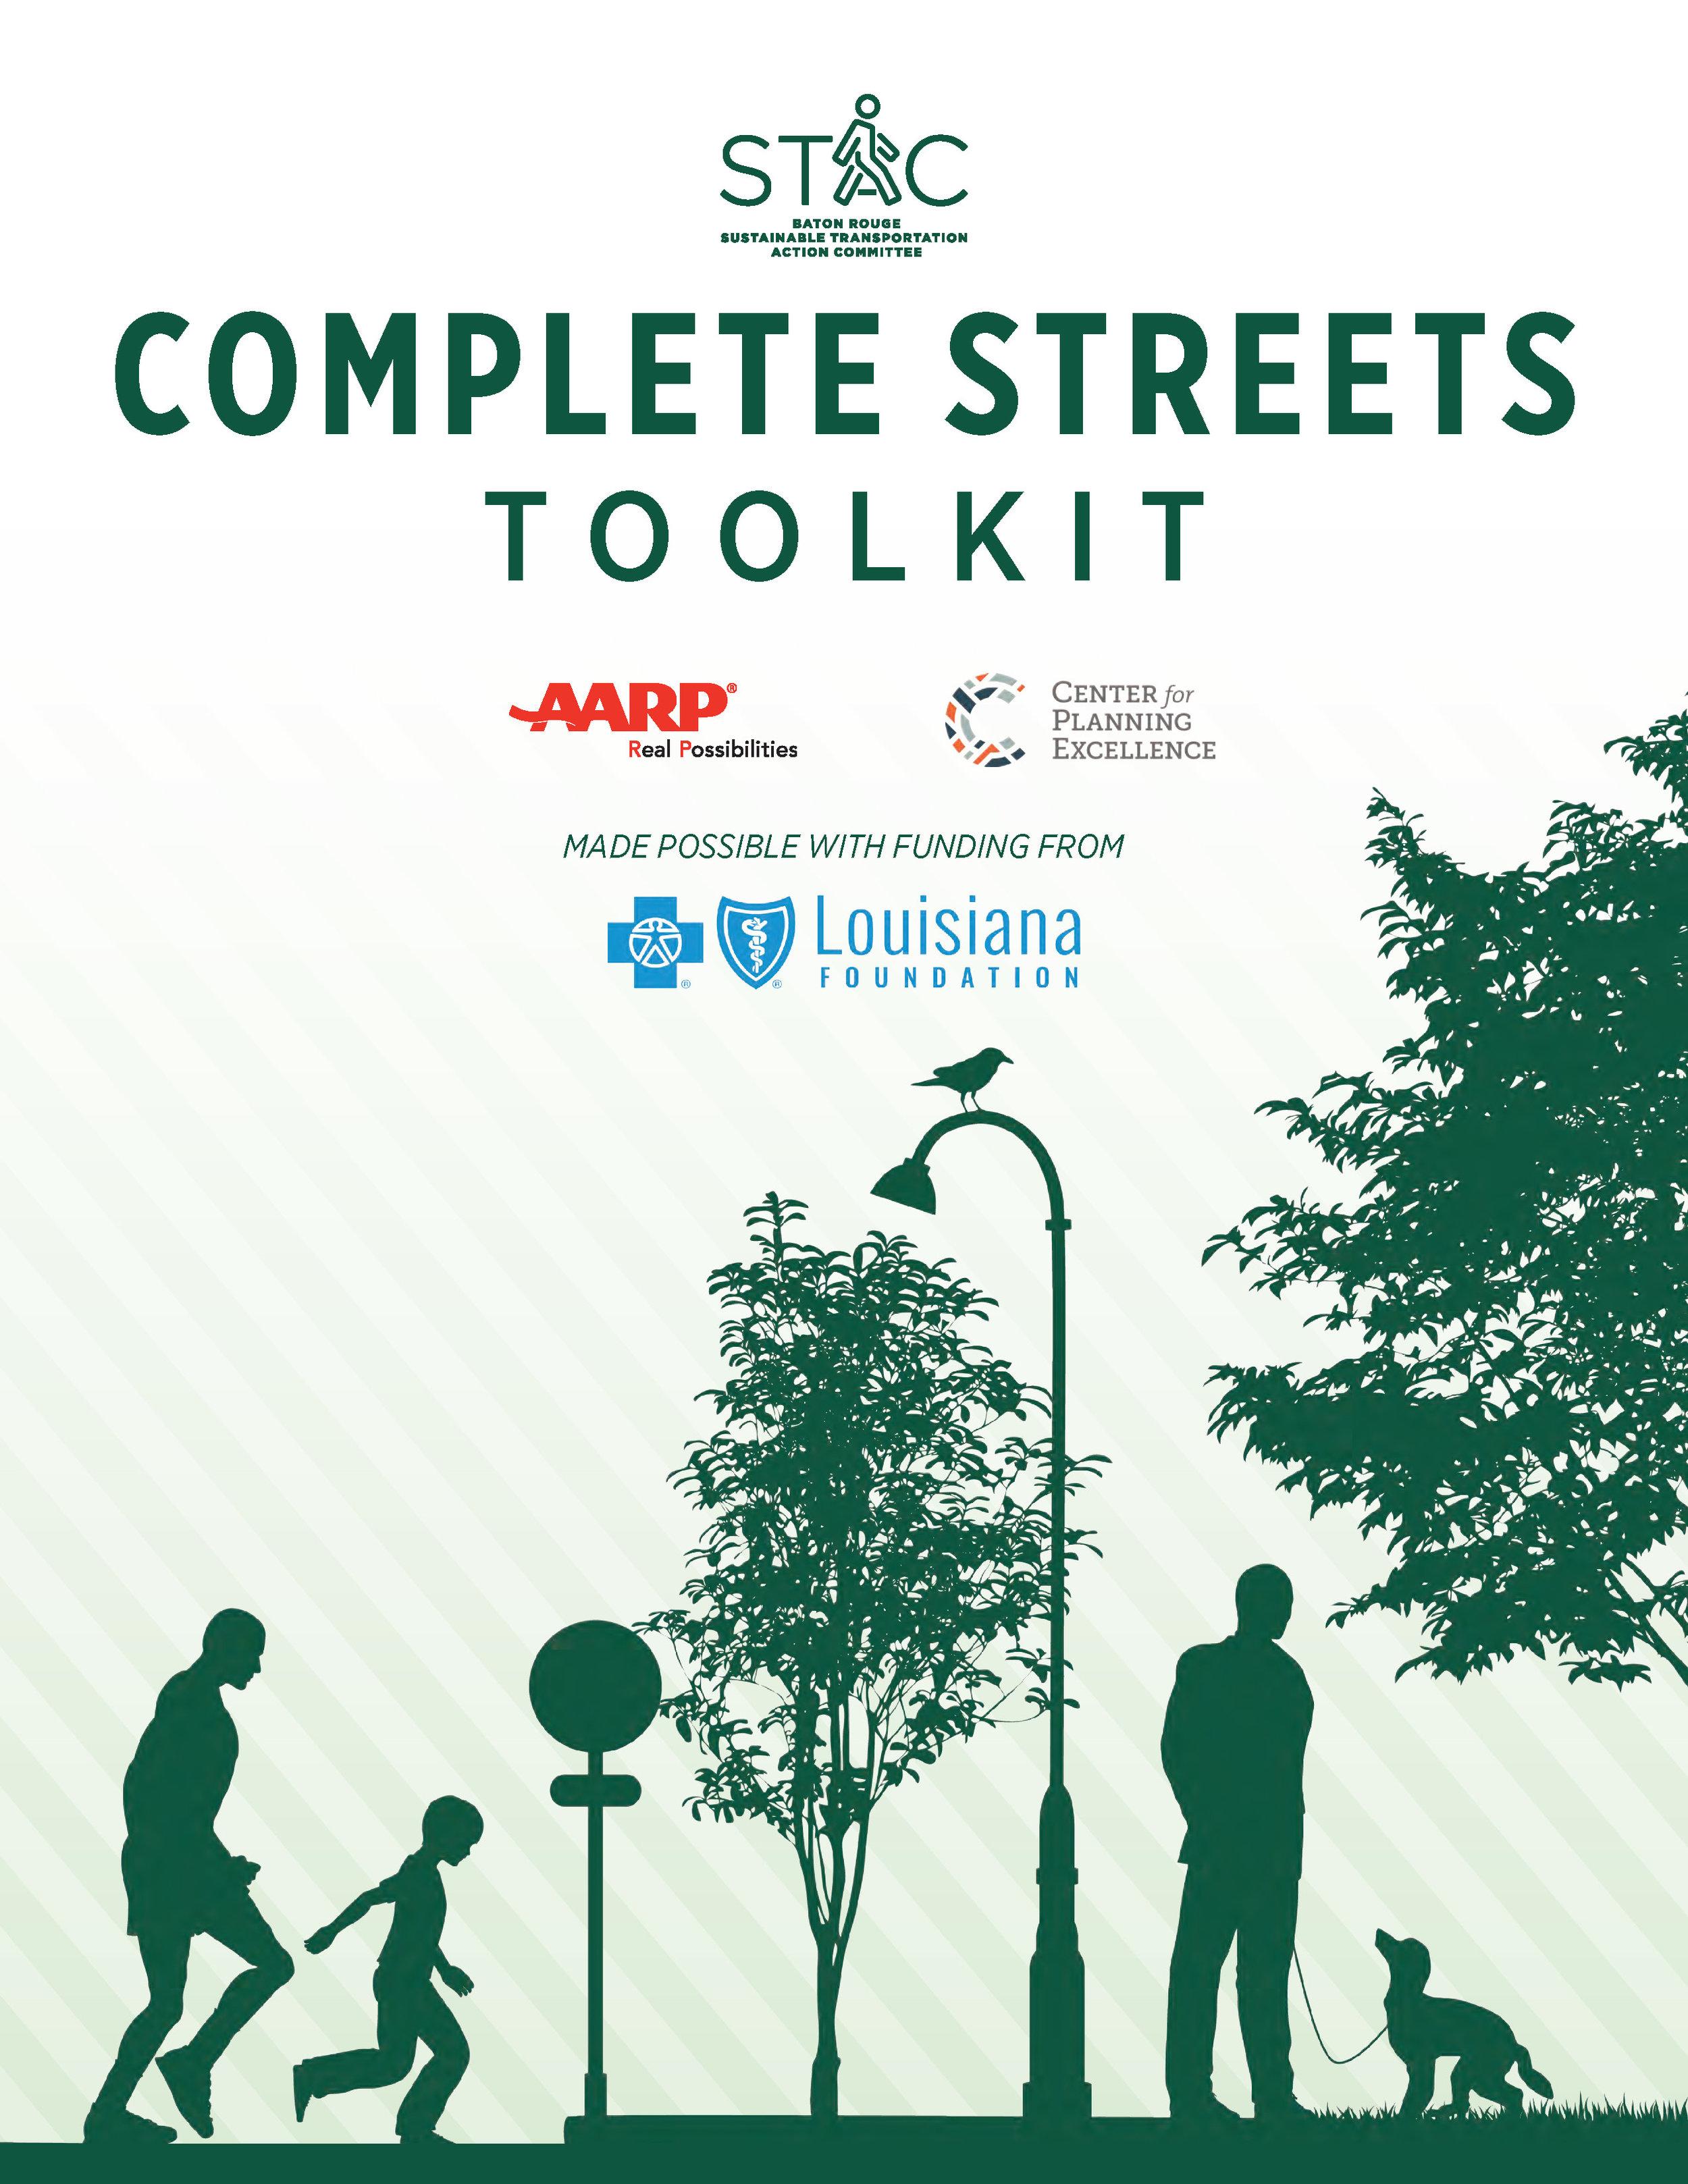 STAC_CompleteStreetToolkit-FINAL.jpg